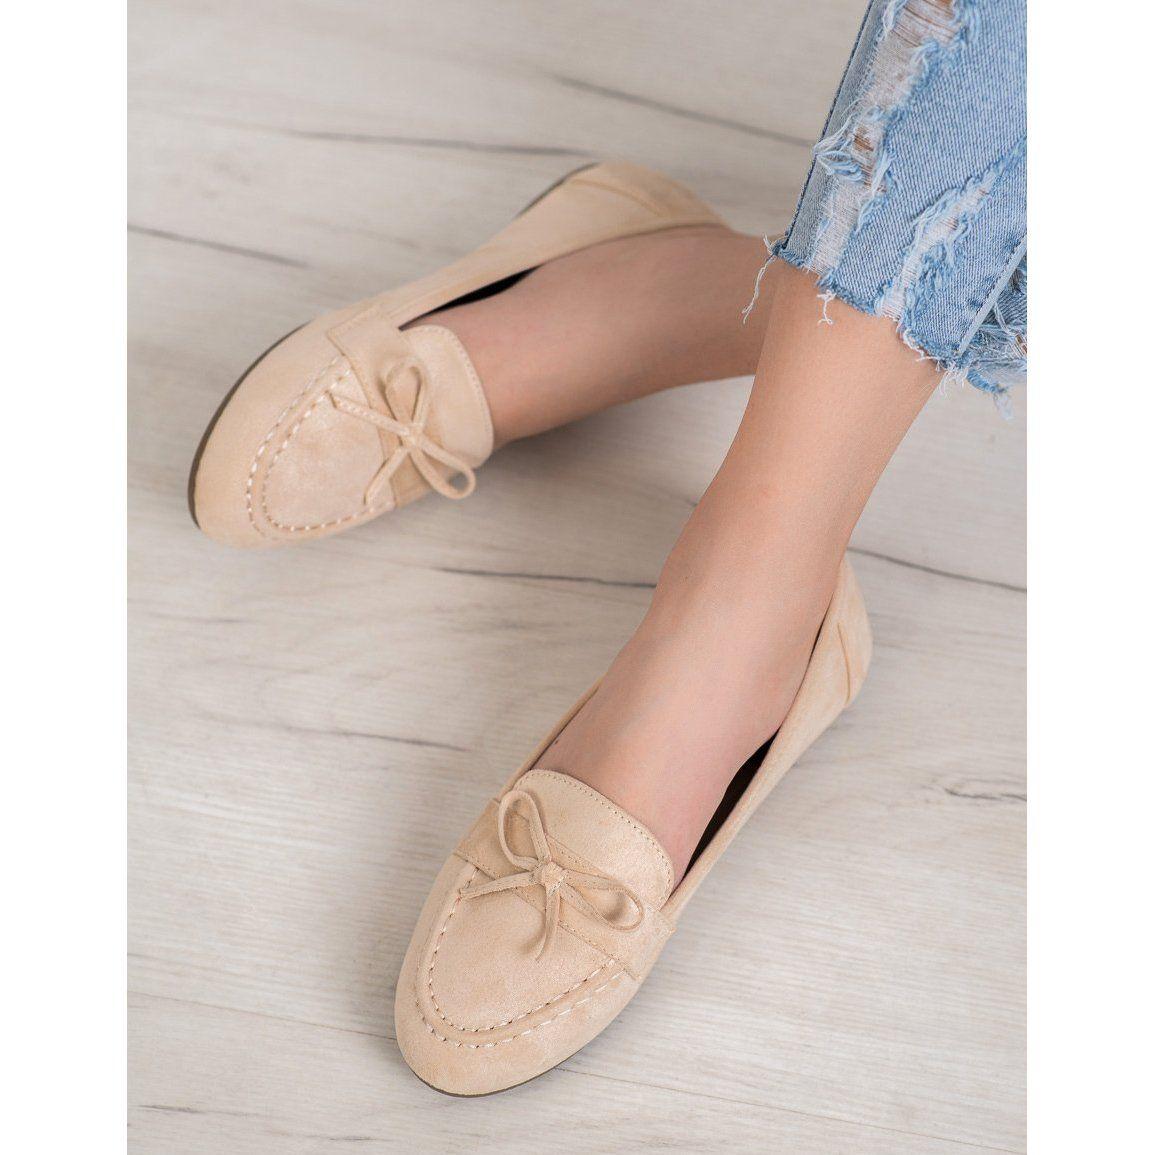 Diamantique Bezowe Mokasyny Bezowy In 2020 Chanel Ballet Flats Ballet Flats Shoes